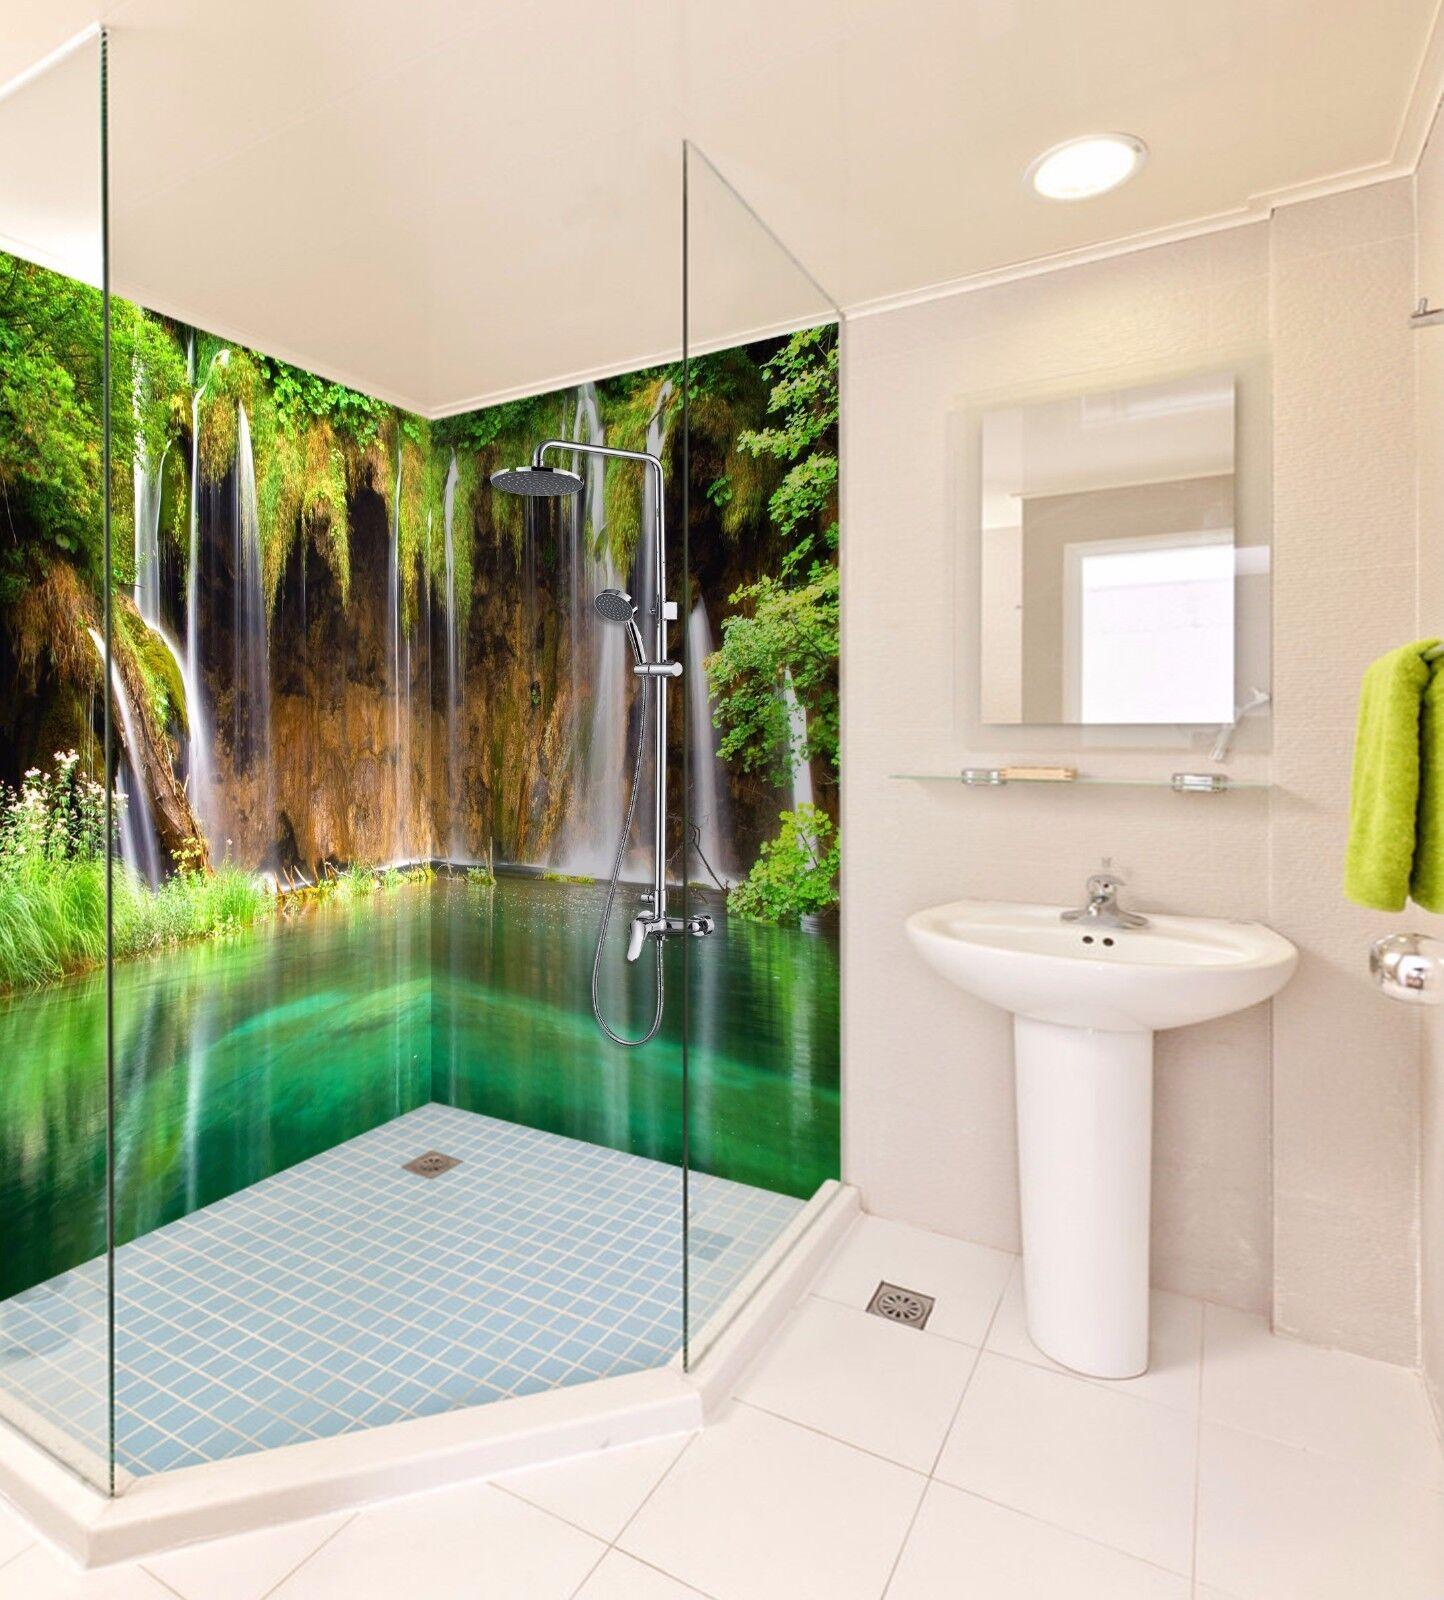 3D Waterfall 734   WallPaper Bathroom Print Decal Wall Deco AJ WALLPAPER AU